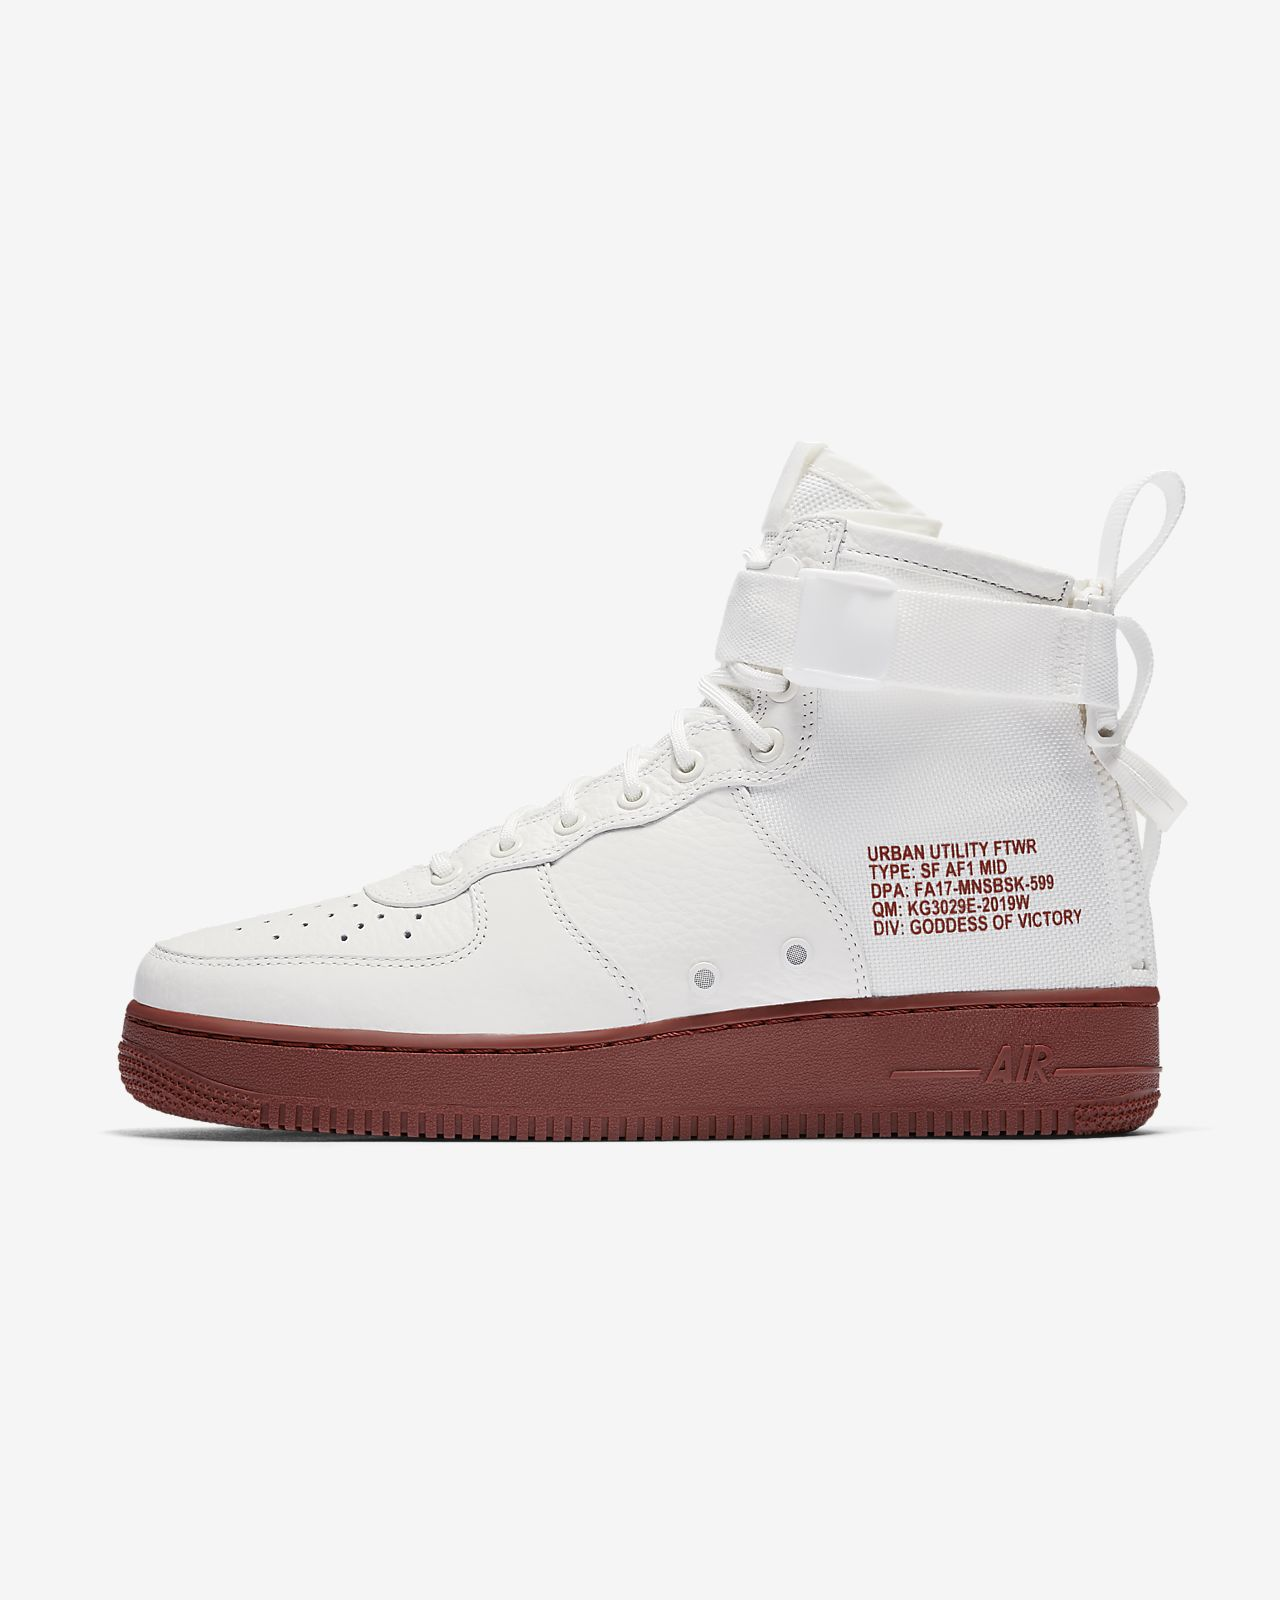 nike sf air force 1 high mens boot nikecom